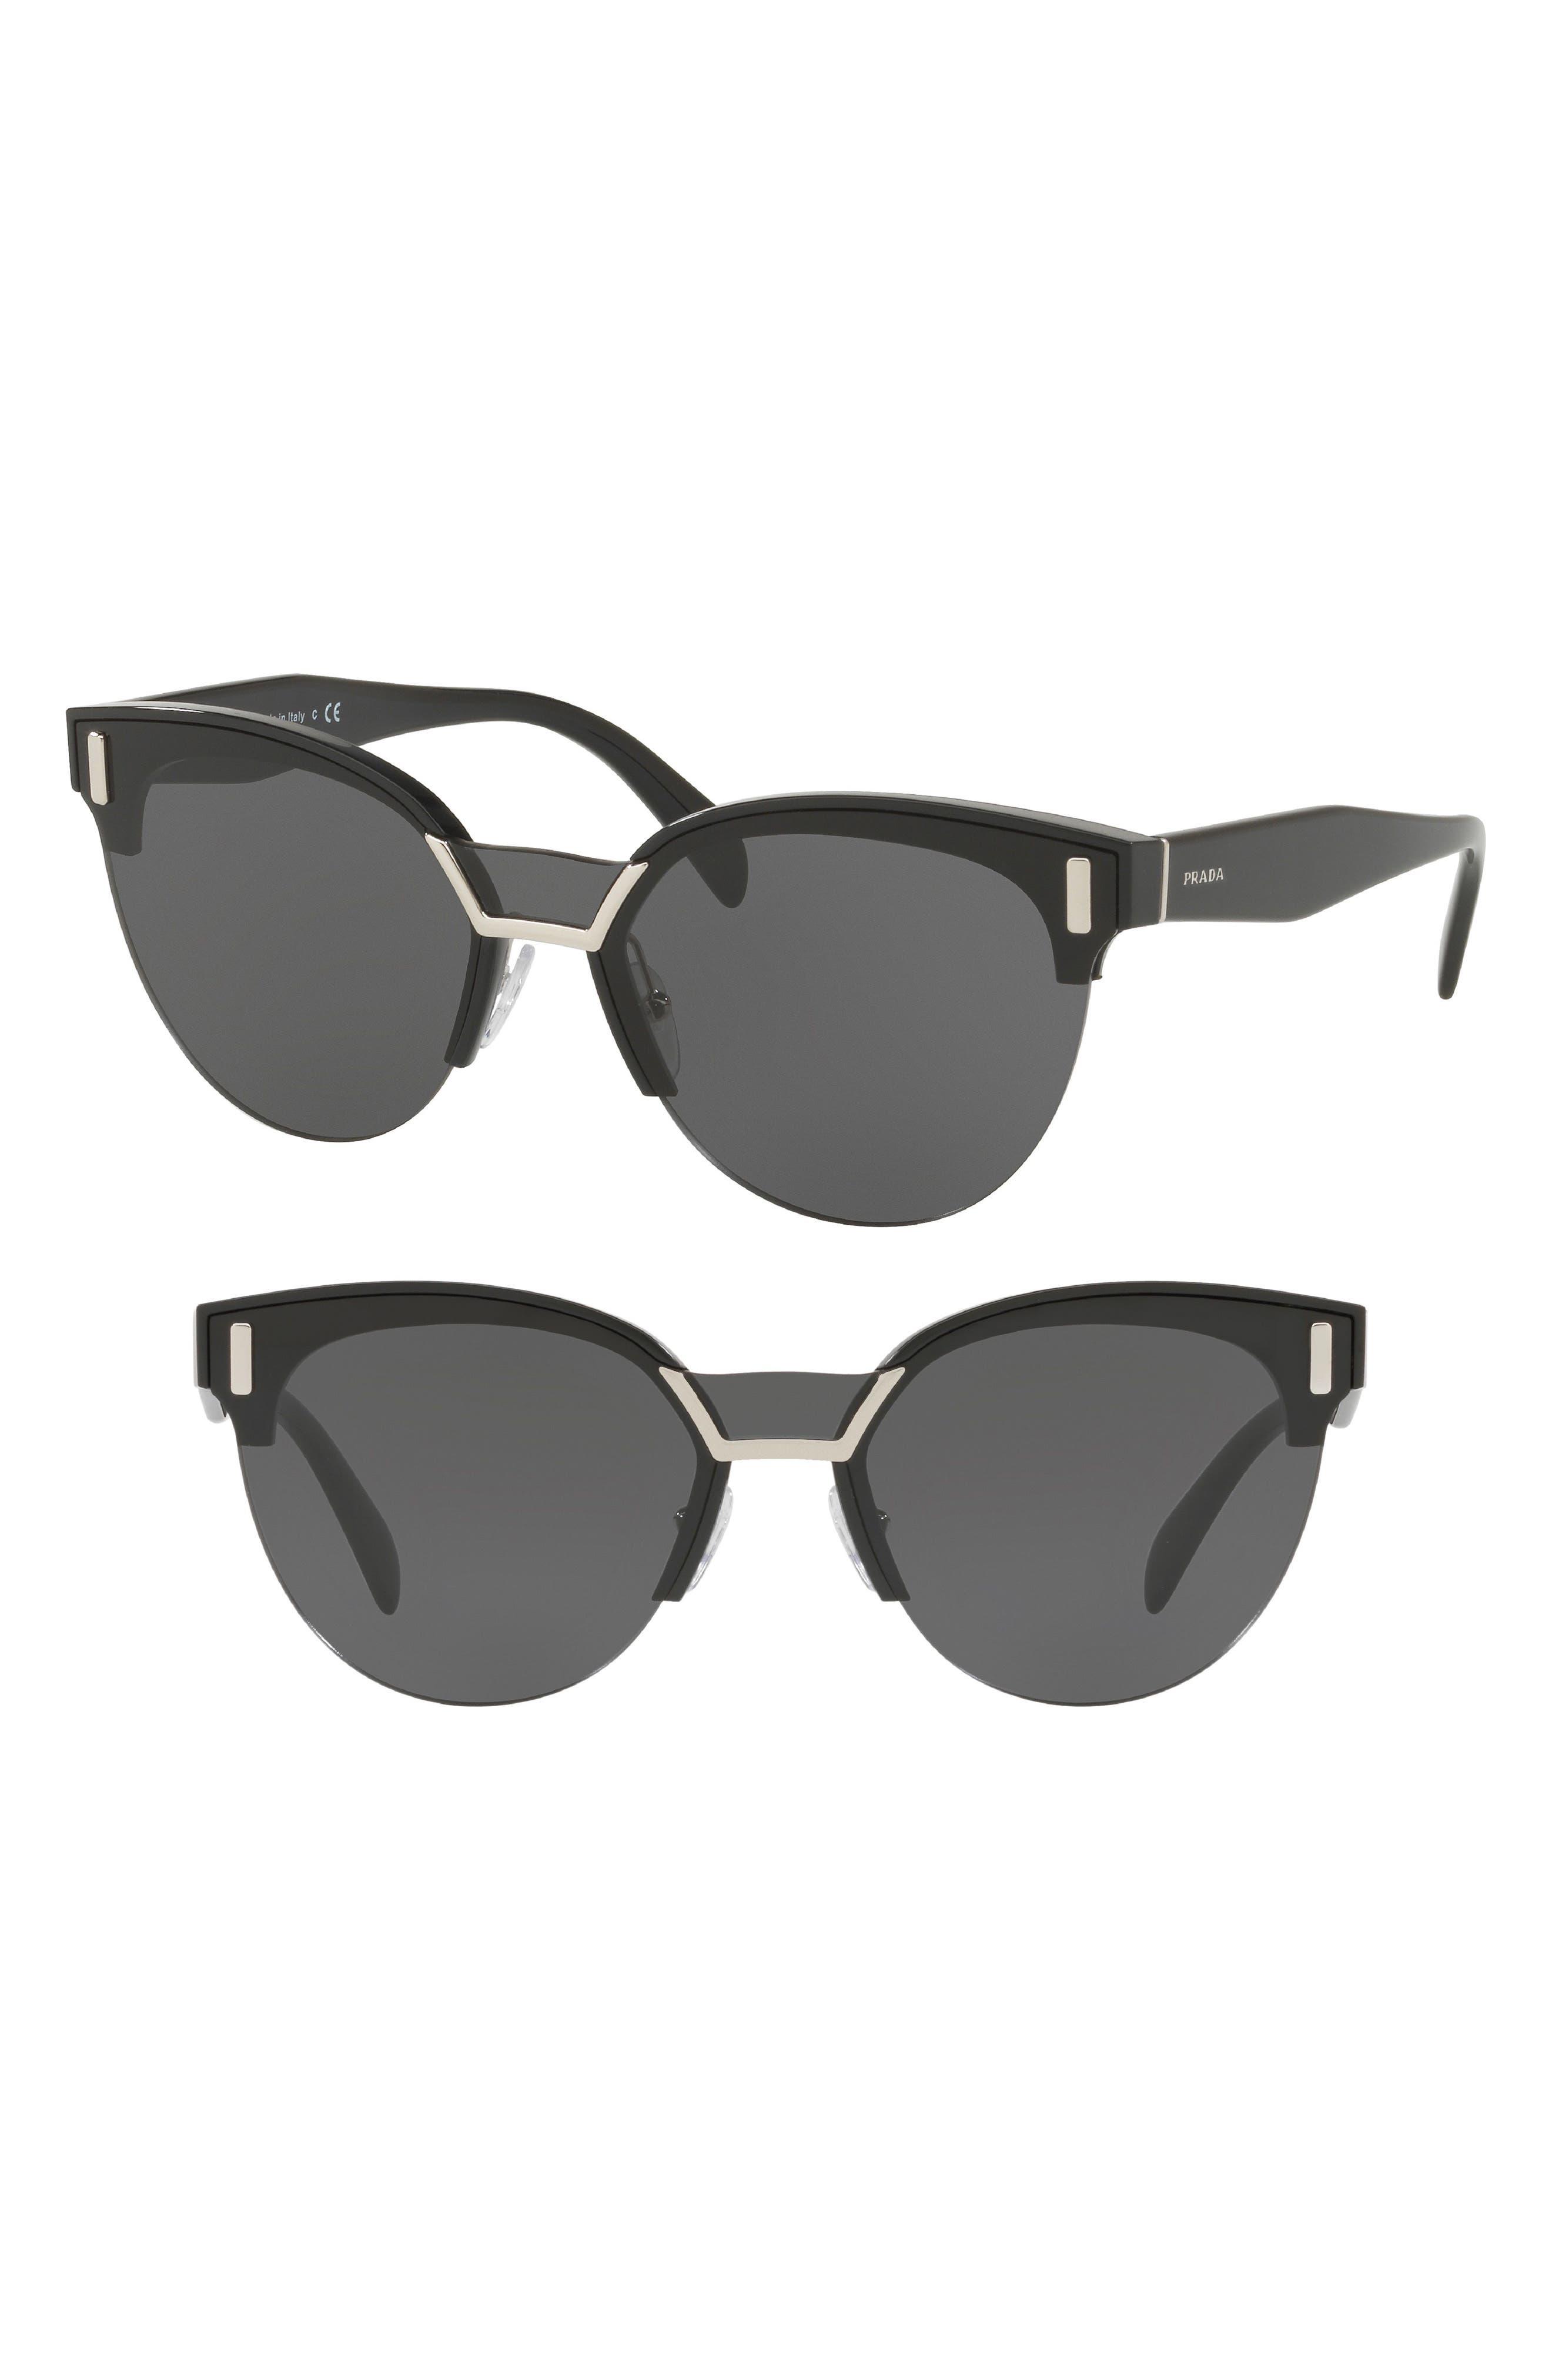 50mm Angular Sunglasses,                             Main thumbnail 1, color,                             Black